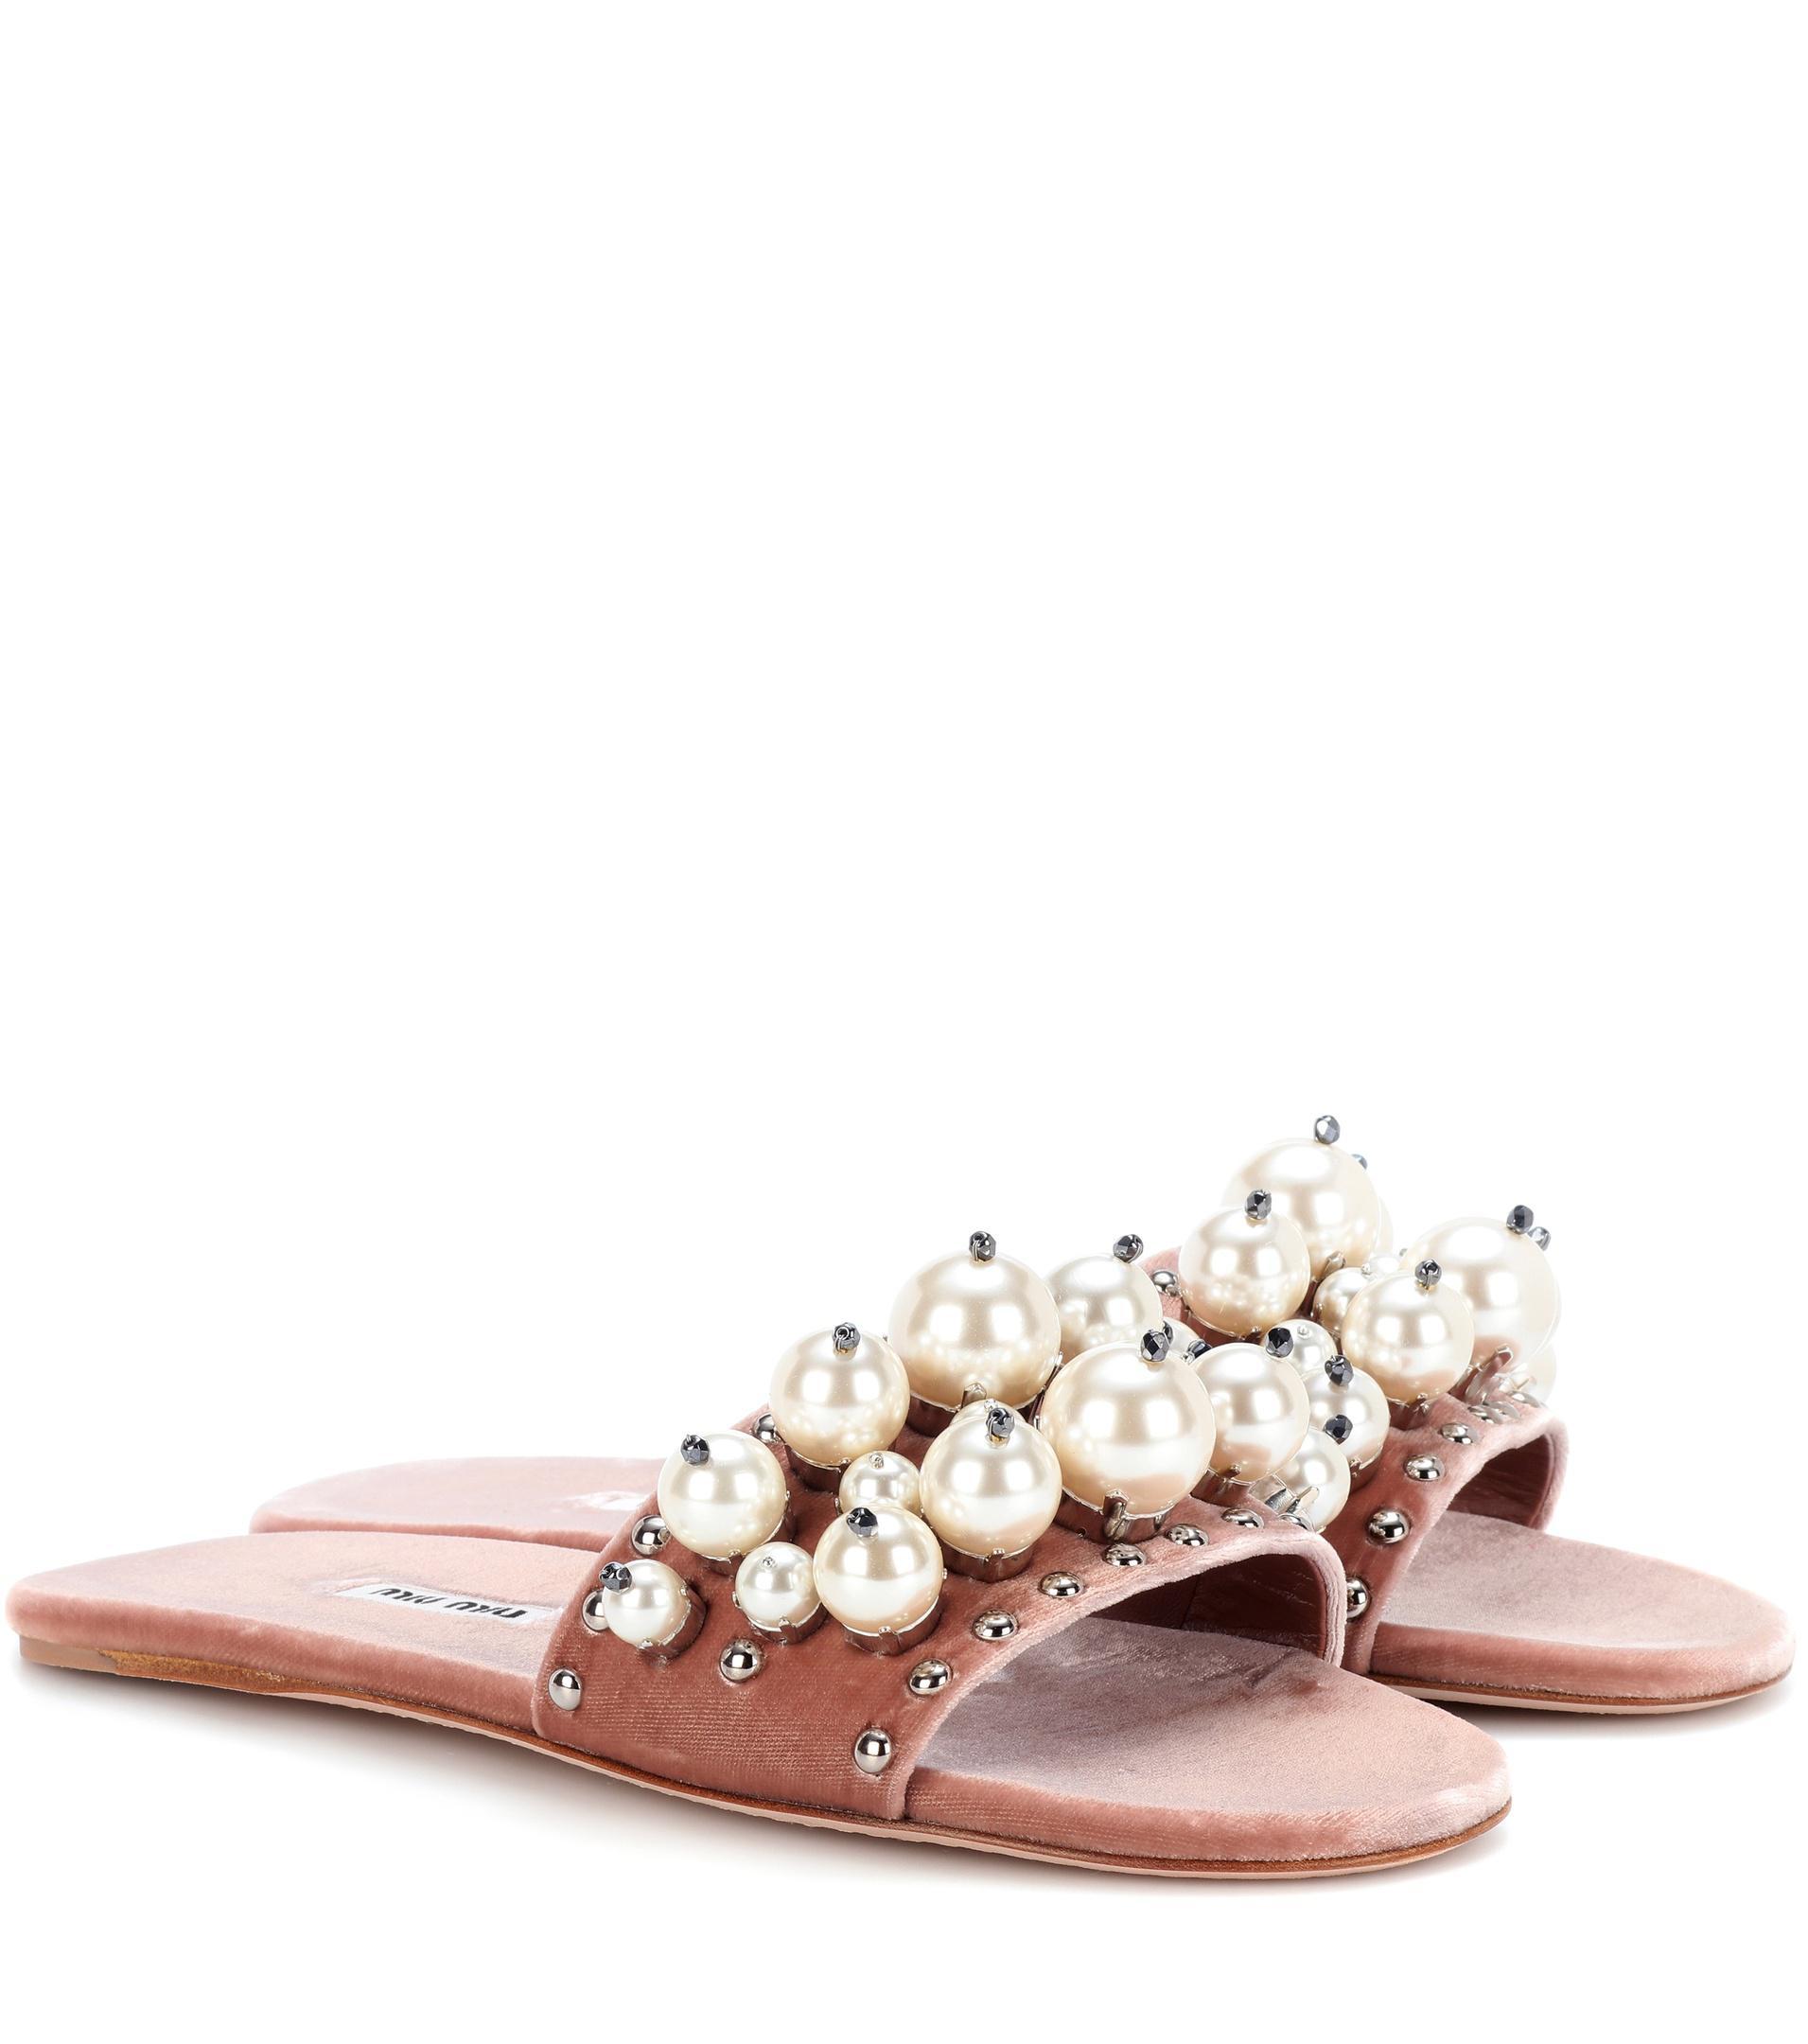 90b9024cbb17 Miu Miu Embellished Velvet Slides in Pink - Lyst